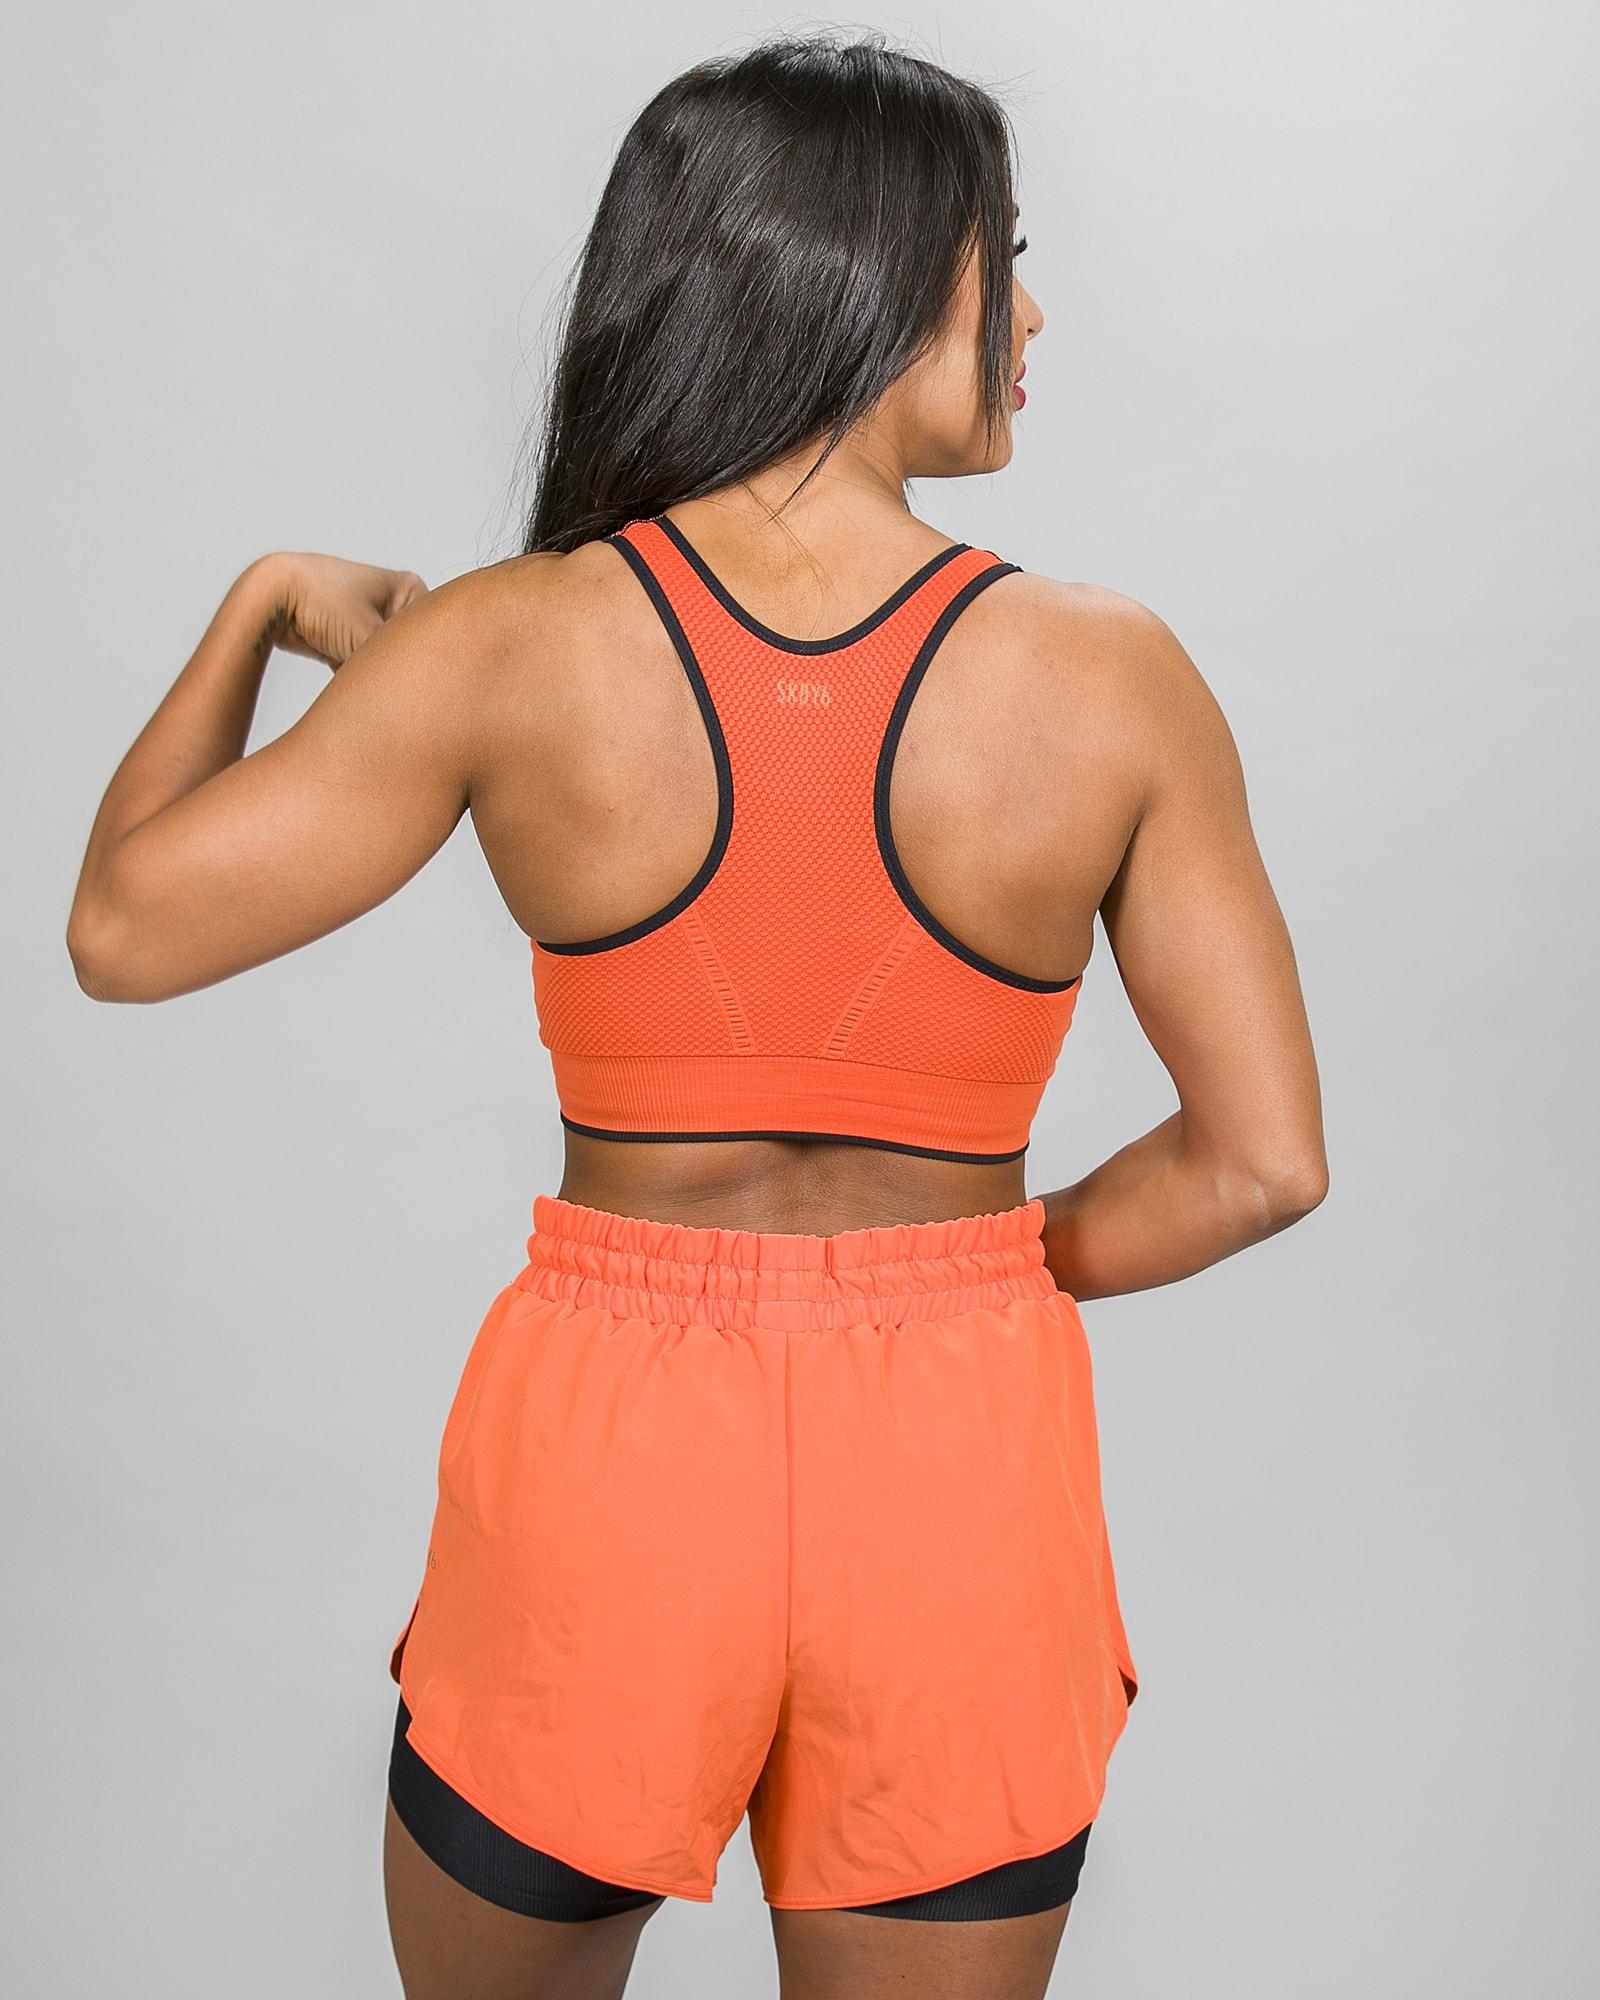 Skiny SK86 Shorts 083111and Crop Top 083094- Blazing Orange j